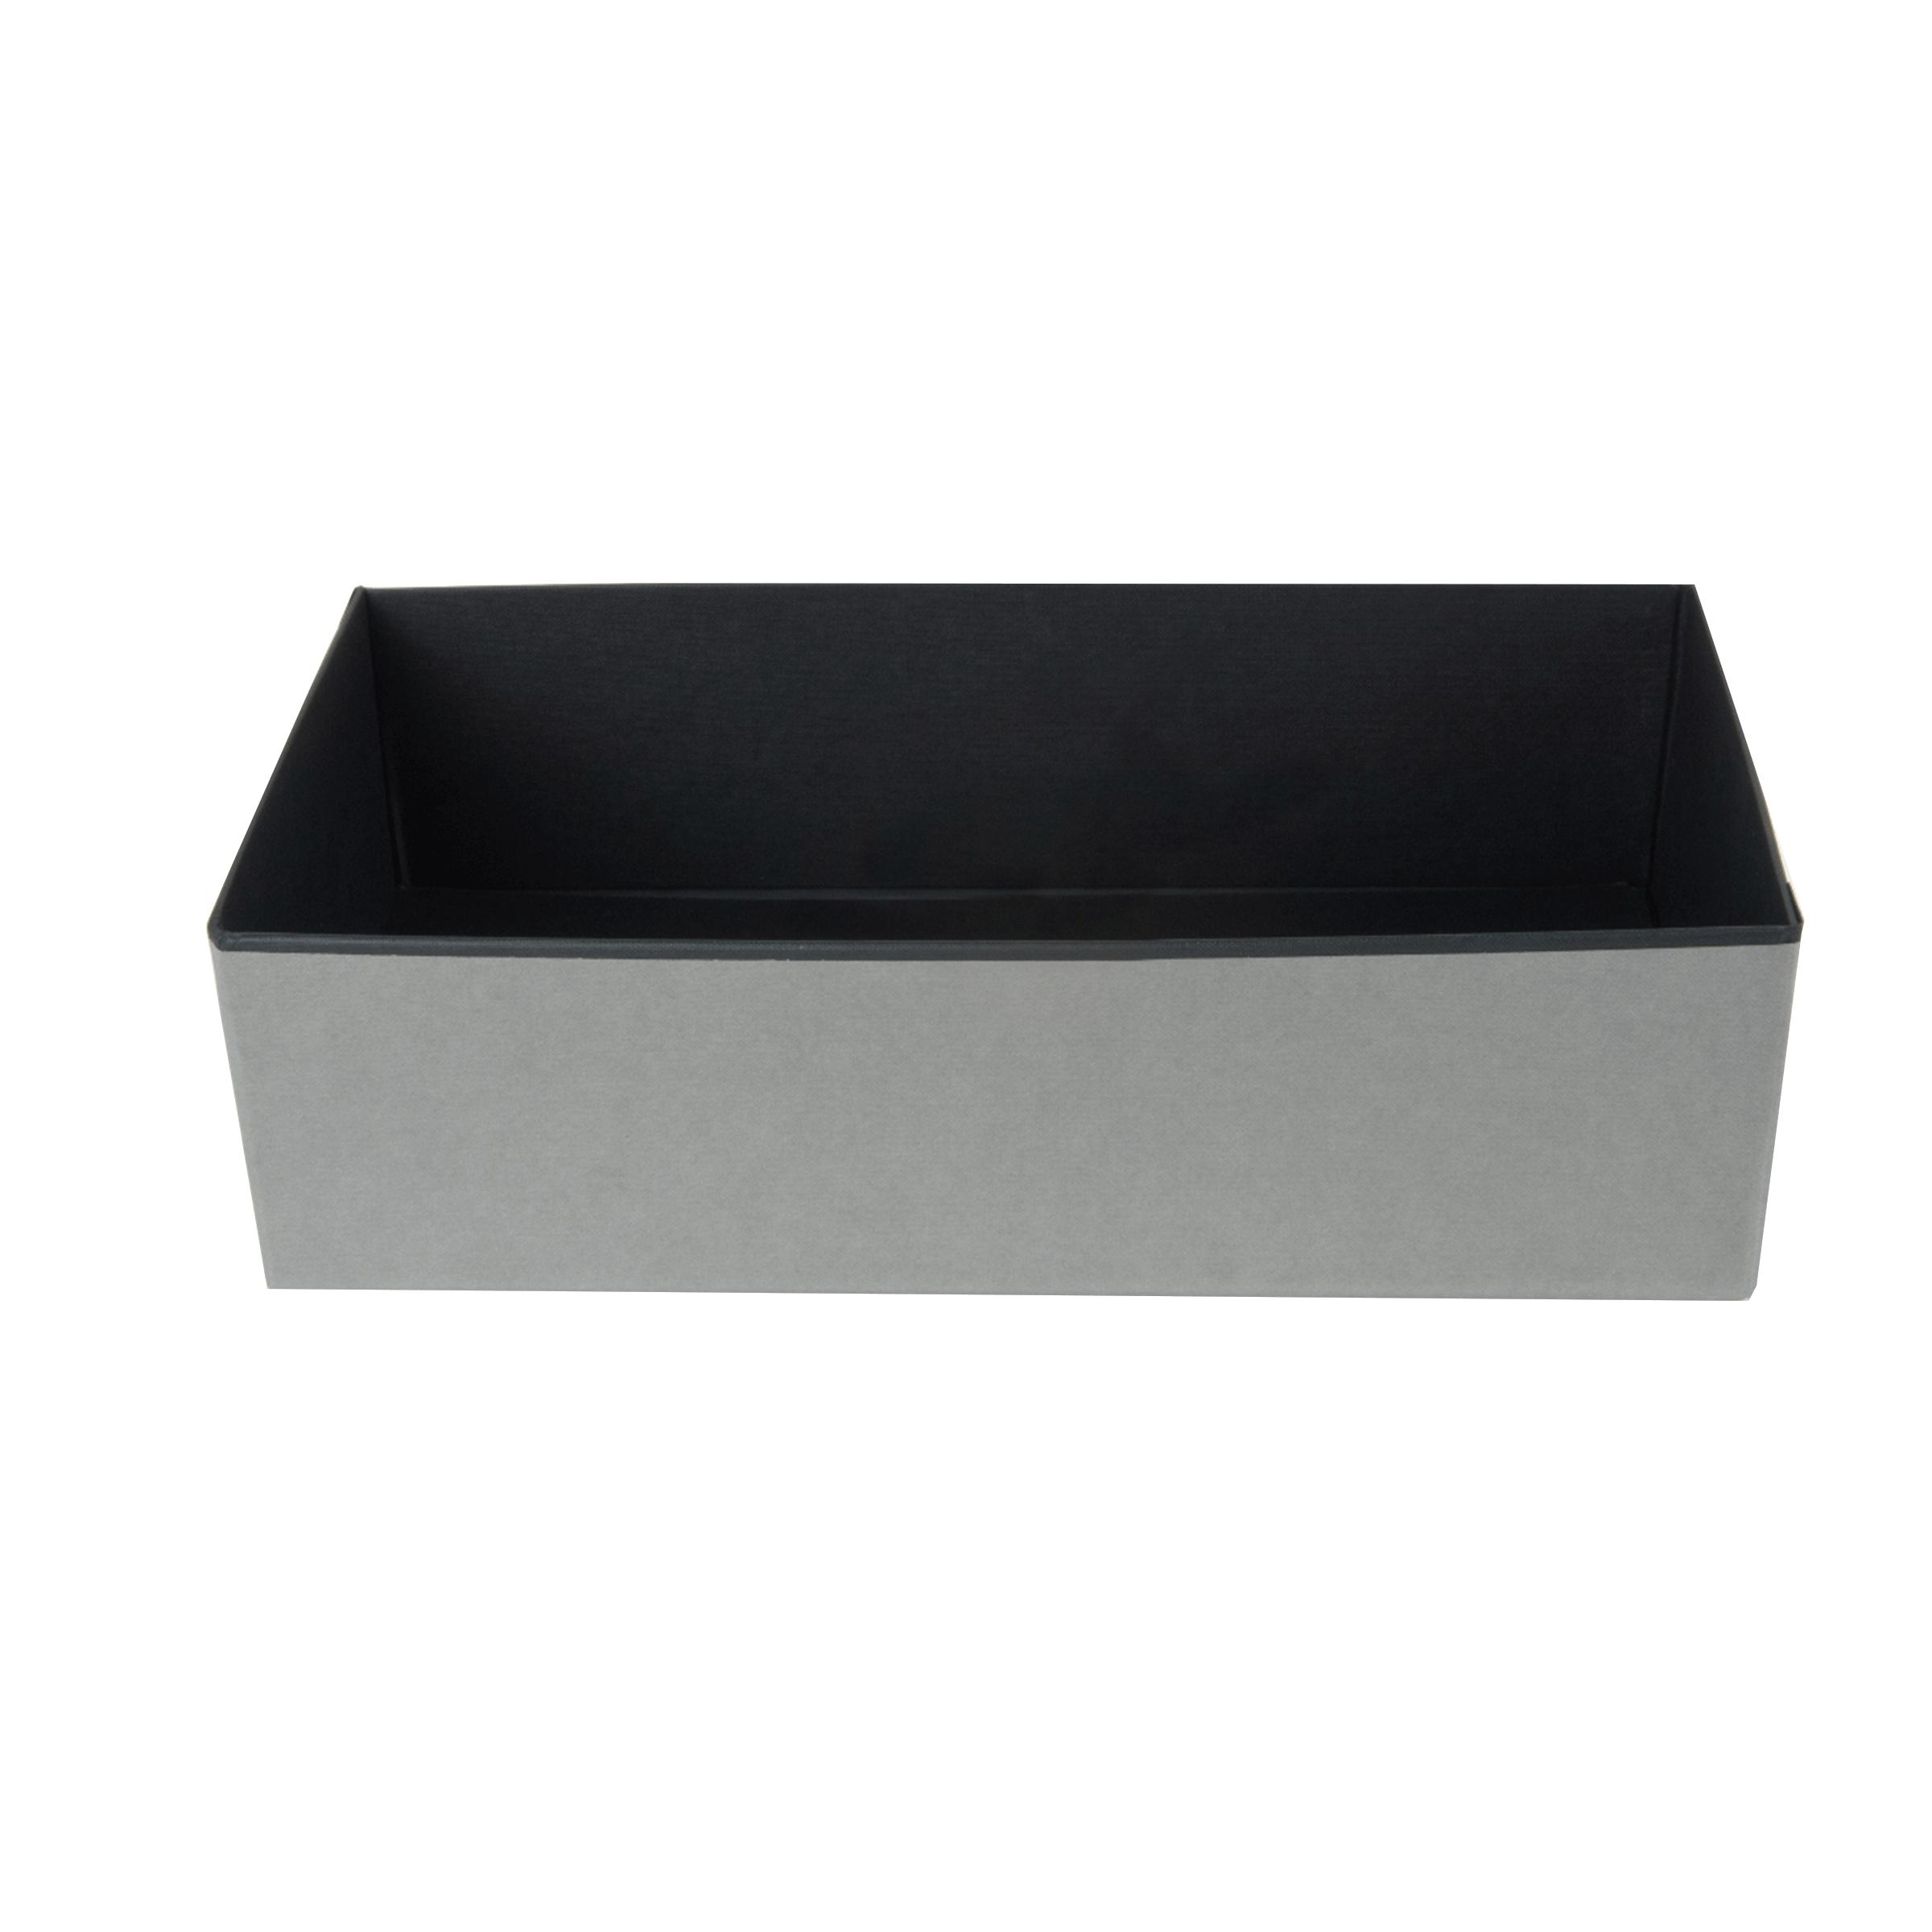 Organisateur de tiroir en carton noir et gris